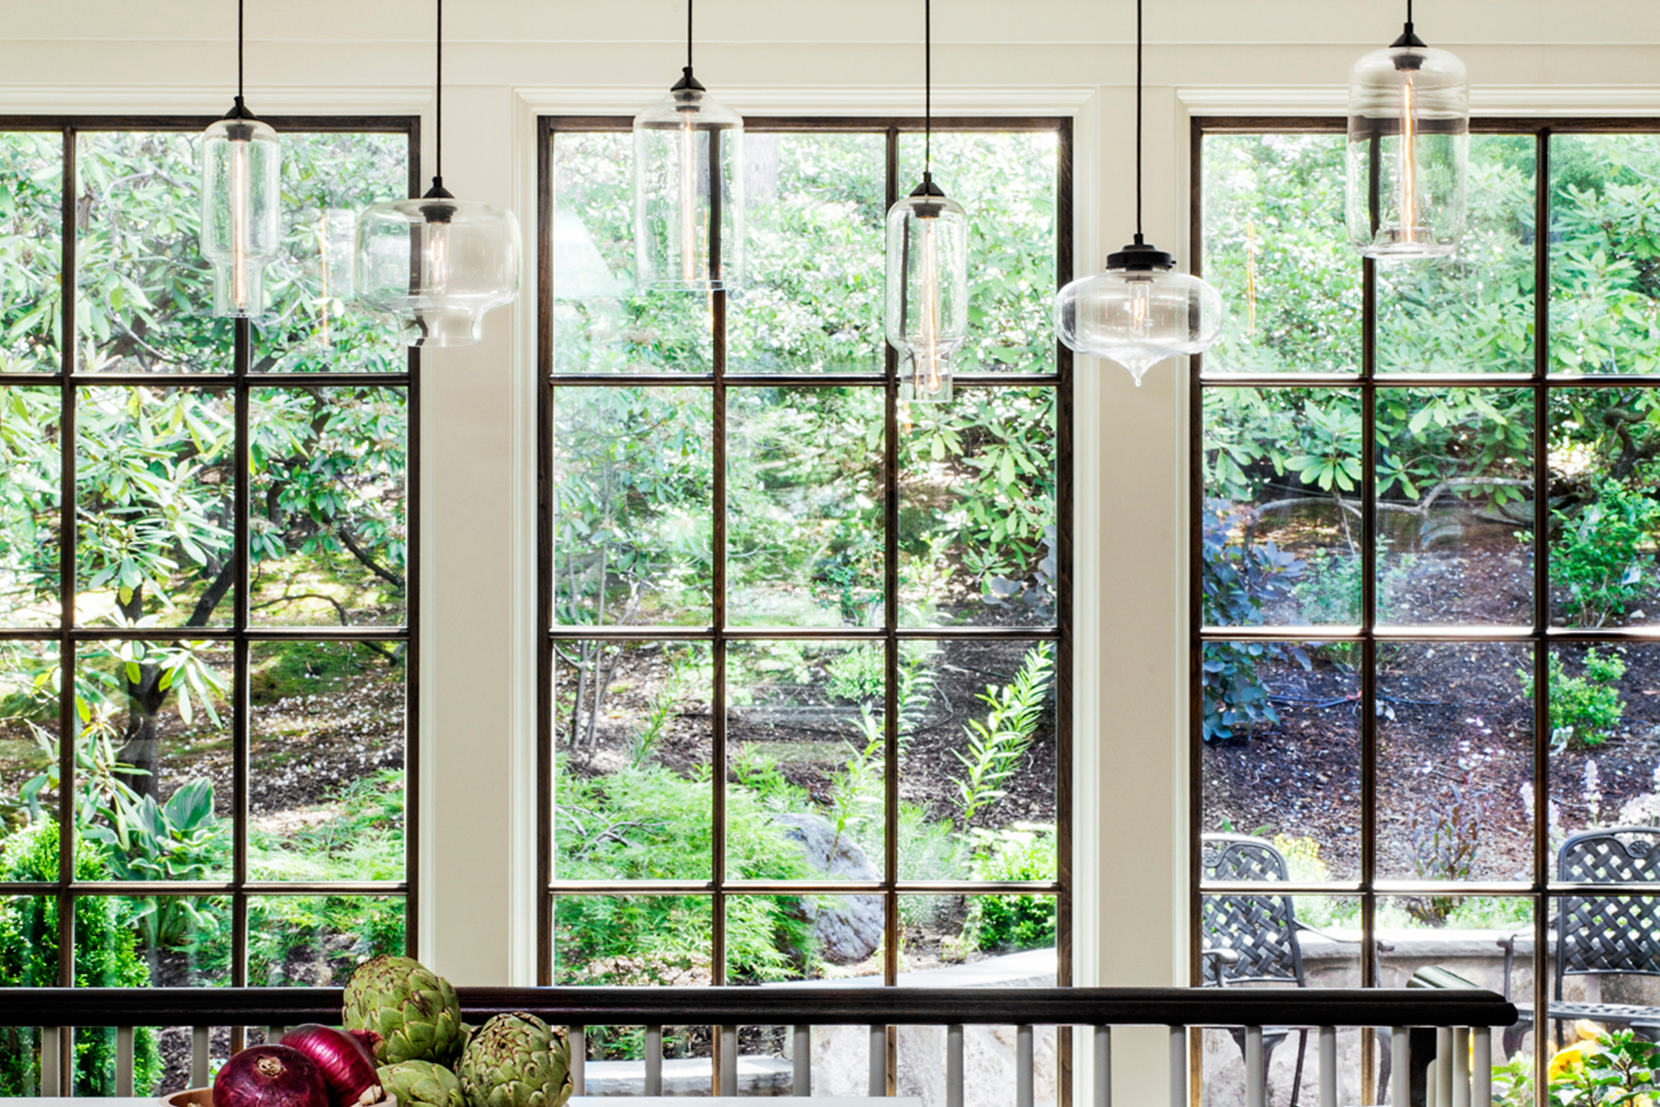 Modern Glass Entry Way Lighting - Mixed Crystal Glass Pendant Lights